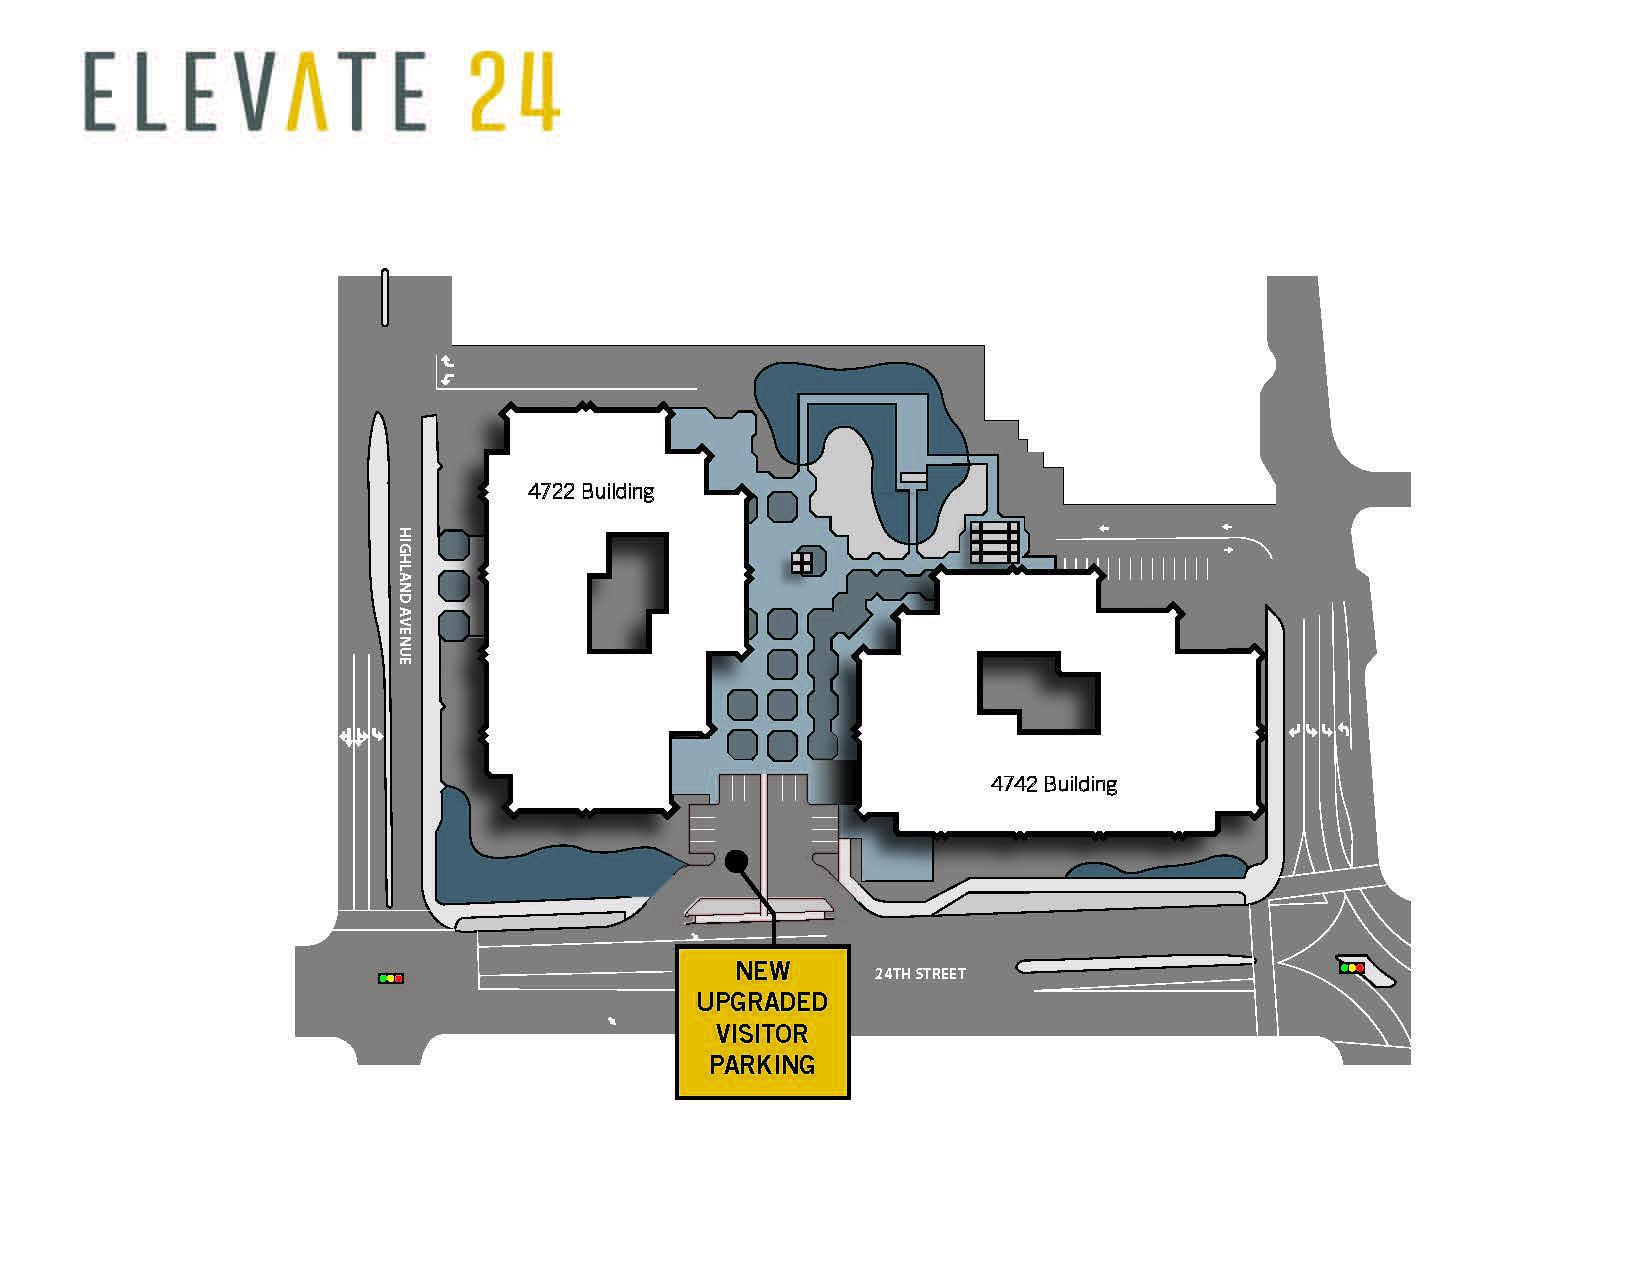 elevate 24 visitor parking_web.jpg